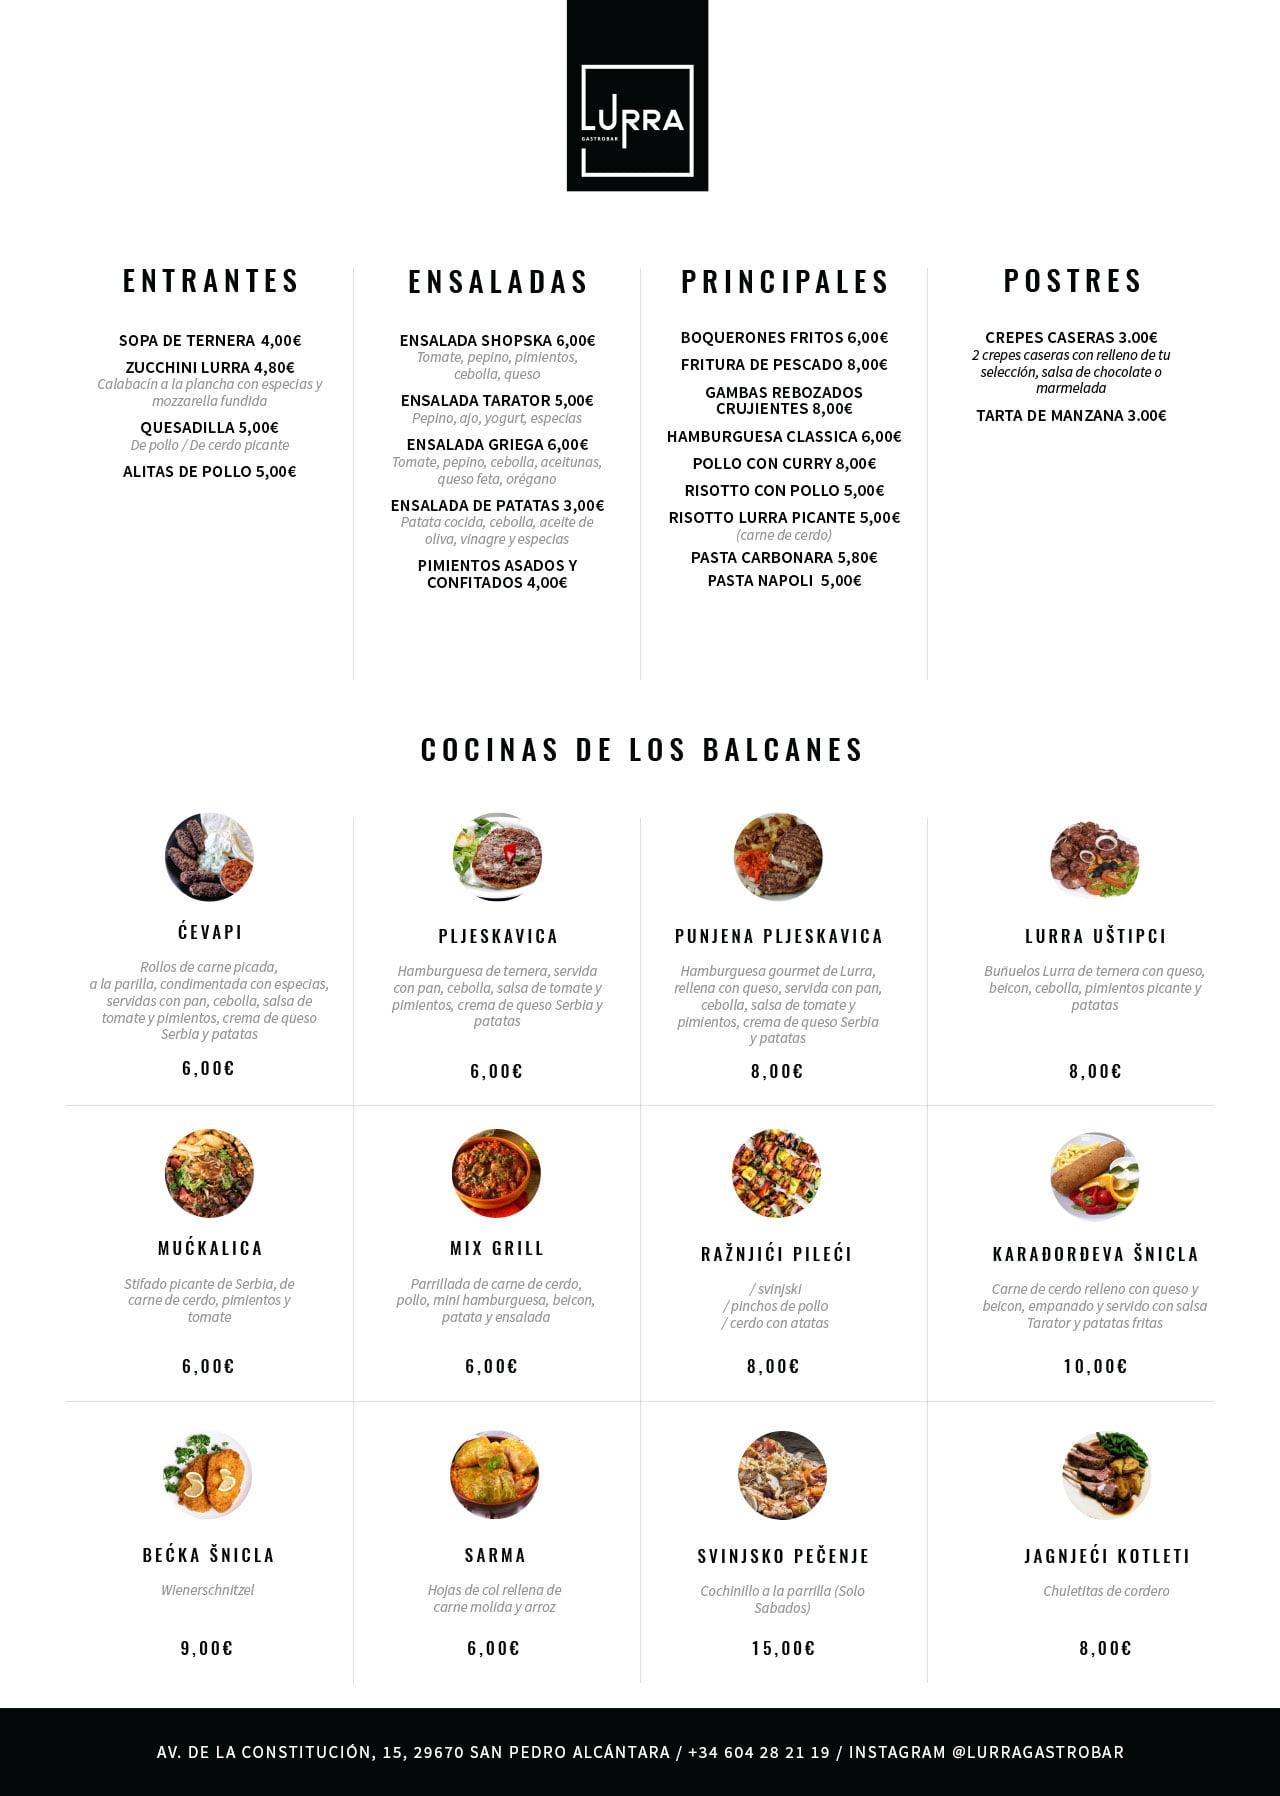 Lura gastro bar food menu design template